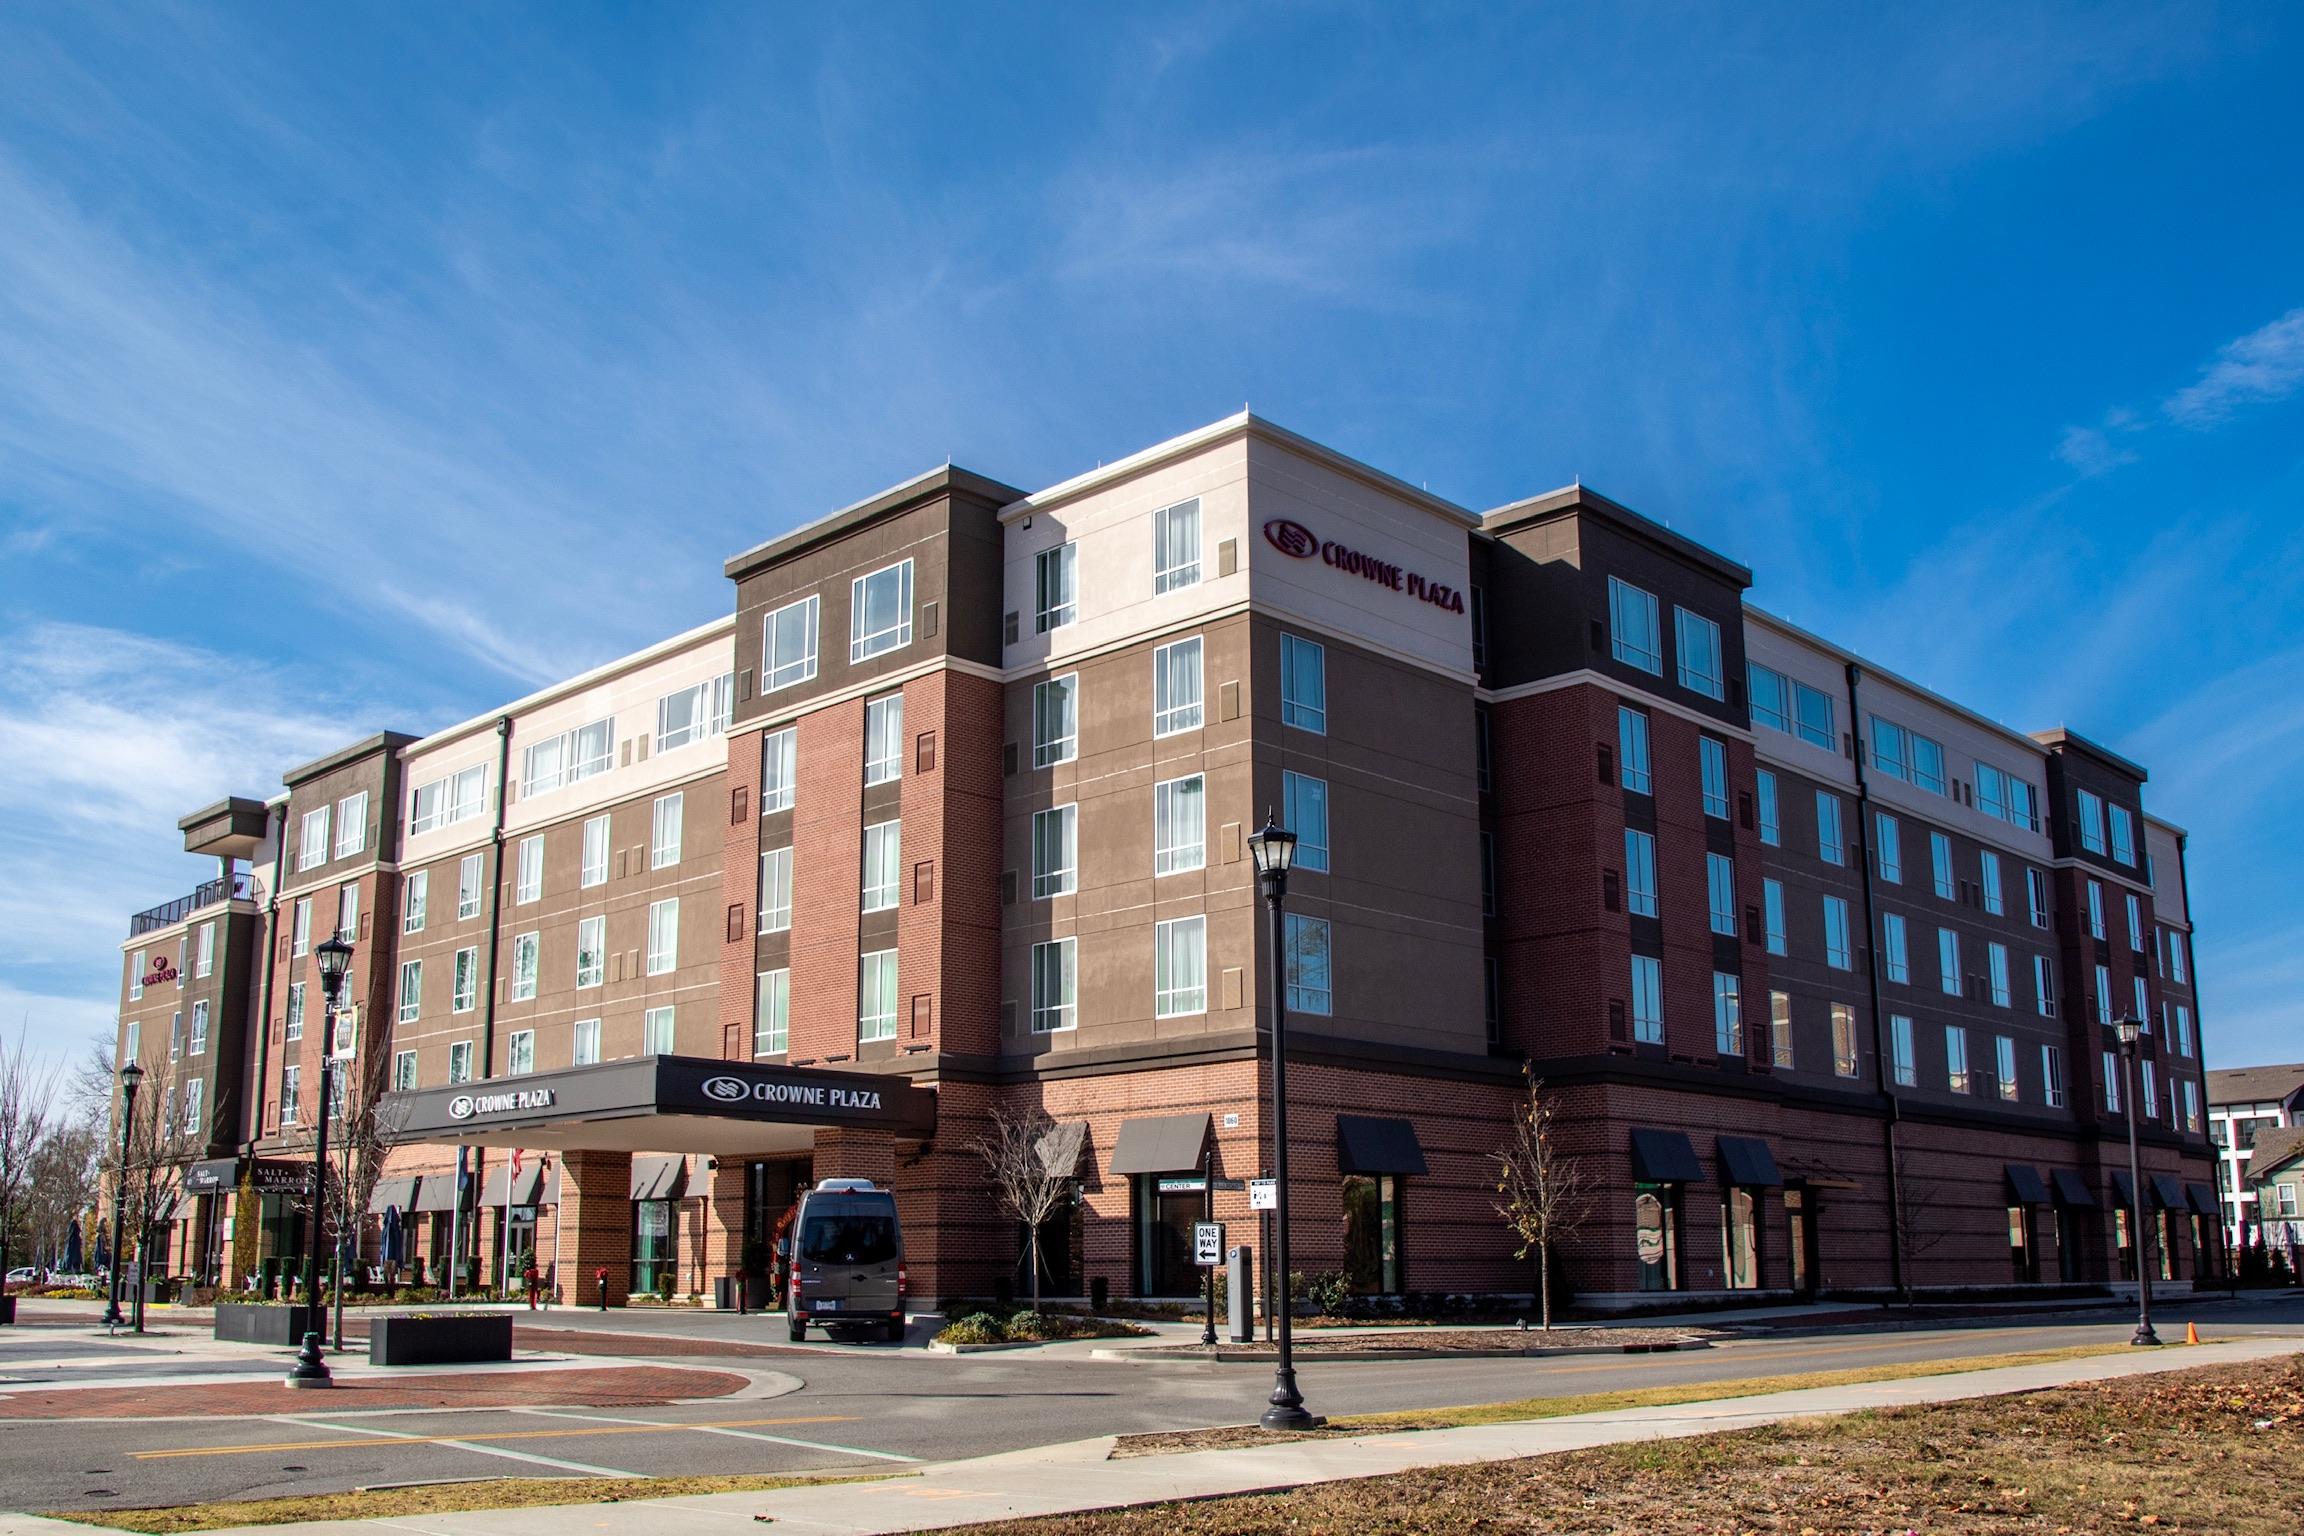 Crowne Plaza, Augusta, GA